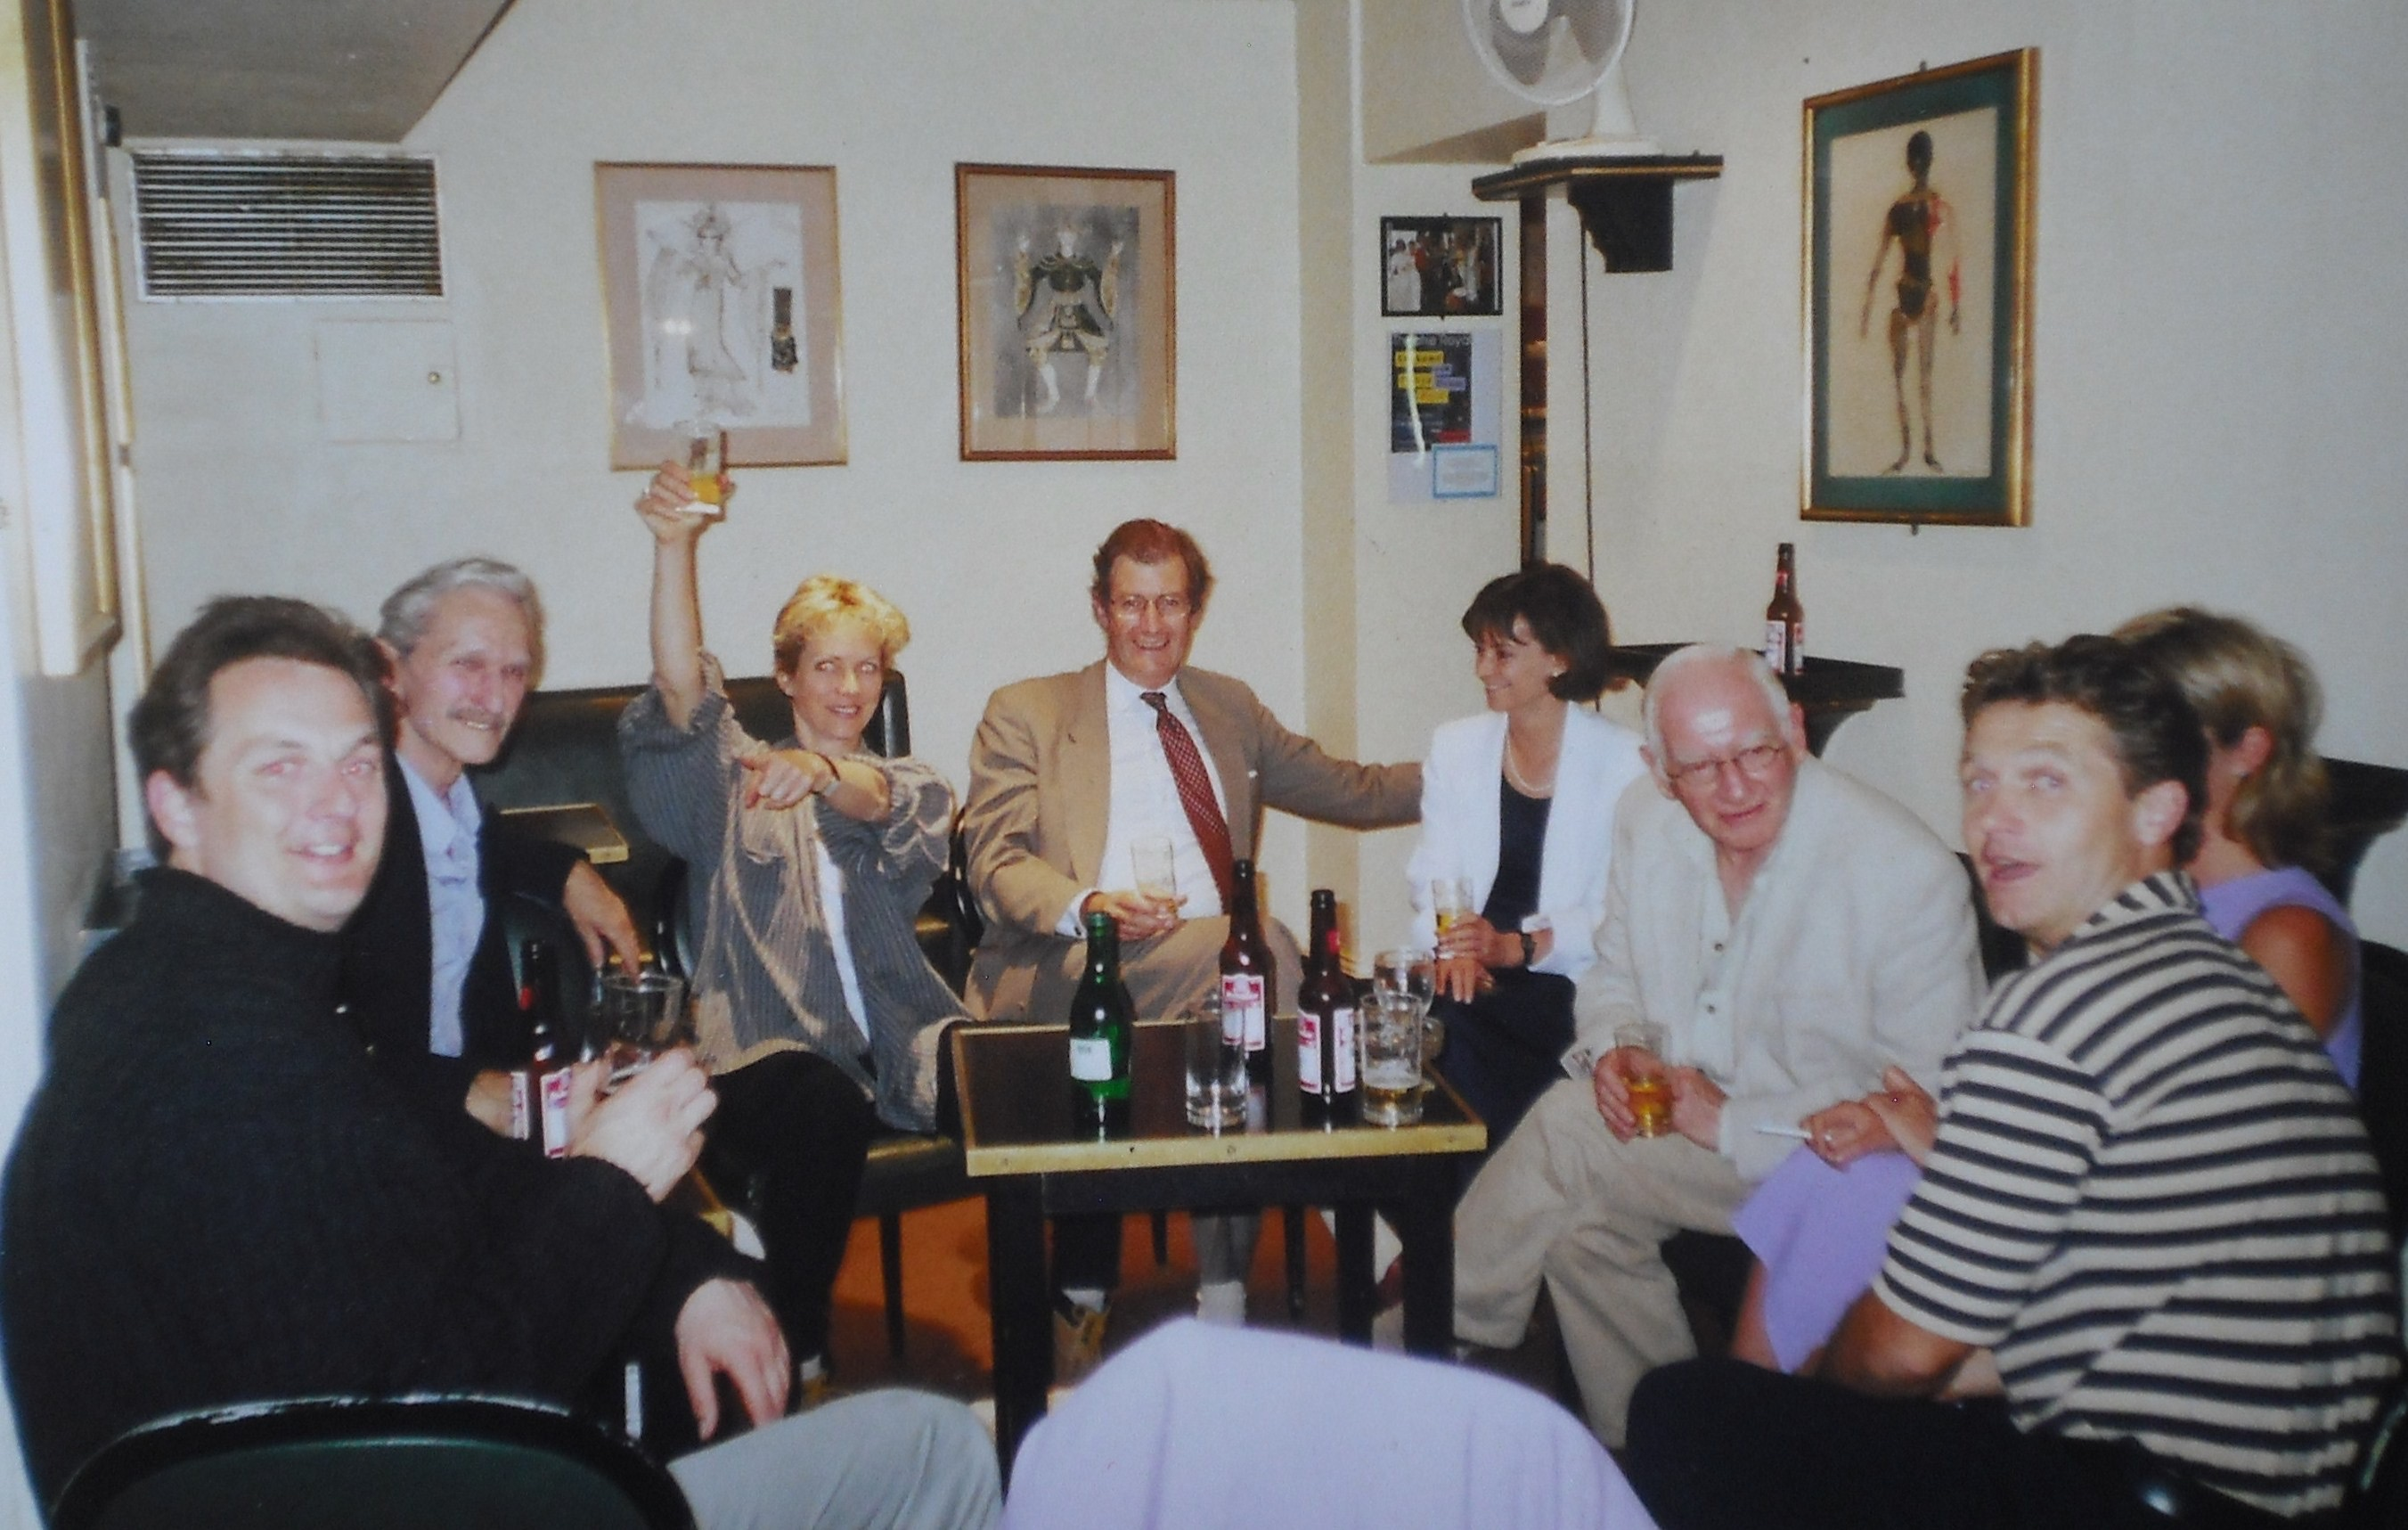 Marcus Lloyd, Donald Howarth, Jenny Seagrove, Mark Piper,  Steven Pinder